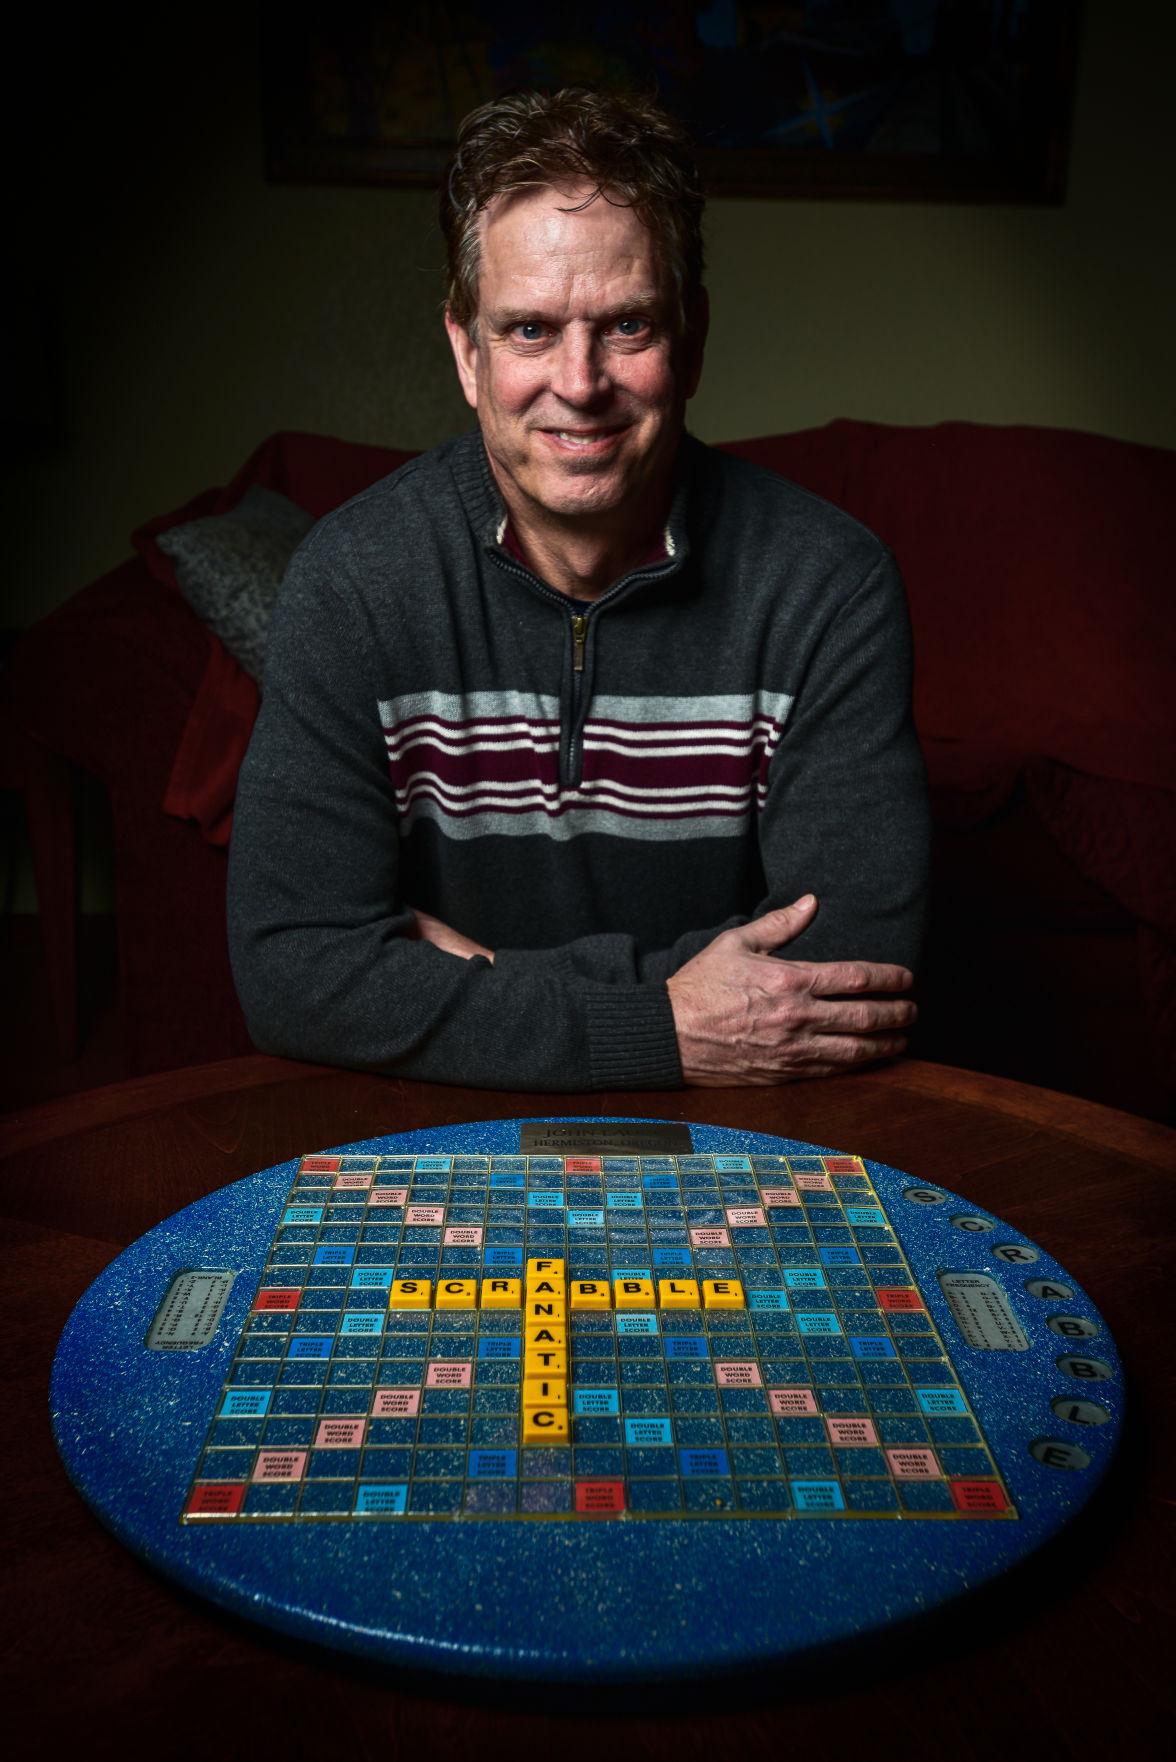 Scrabble Master